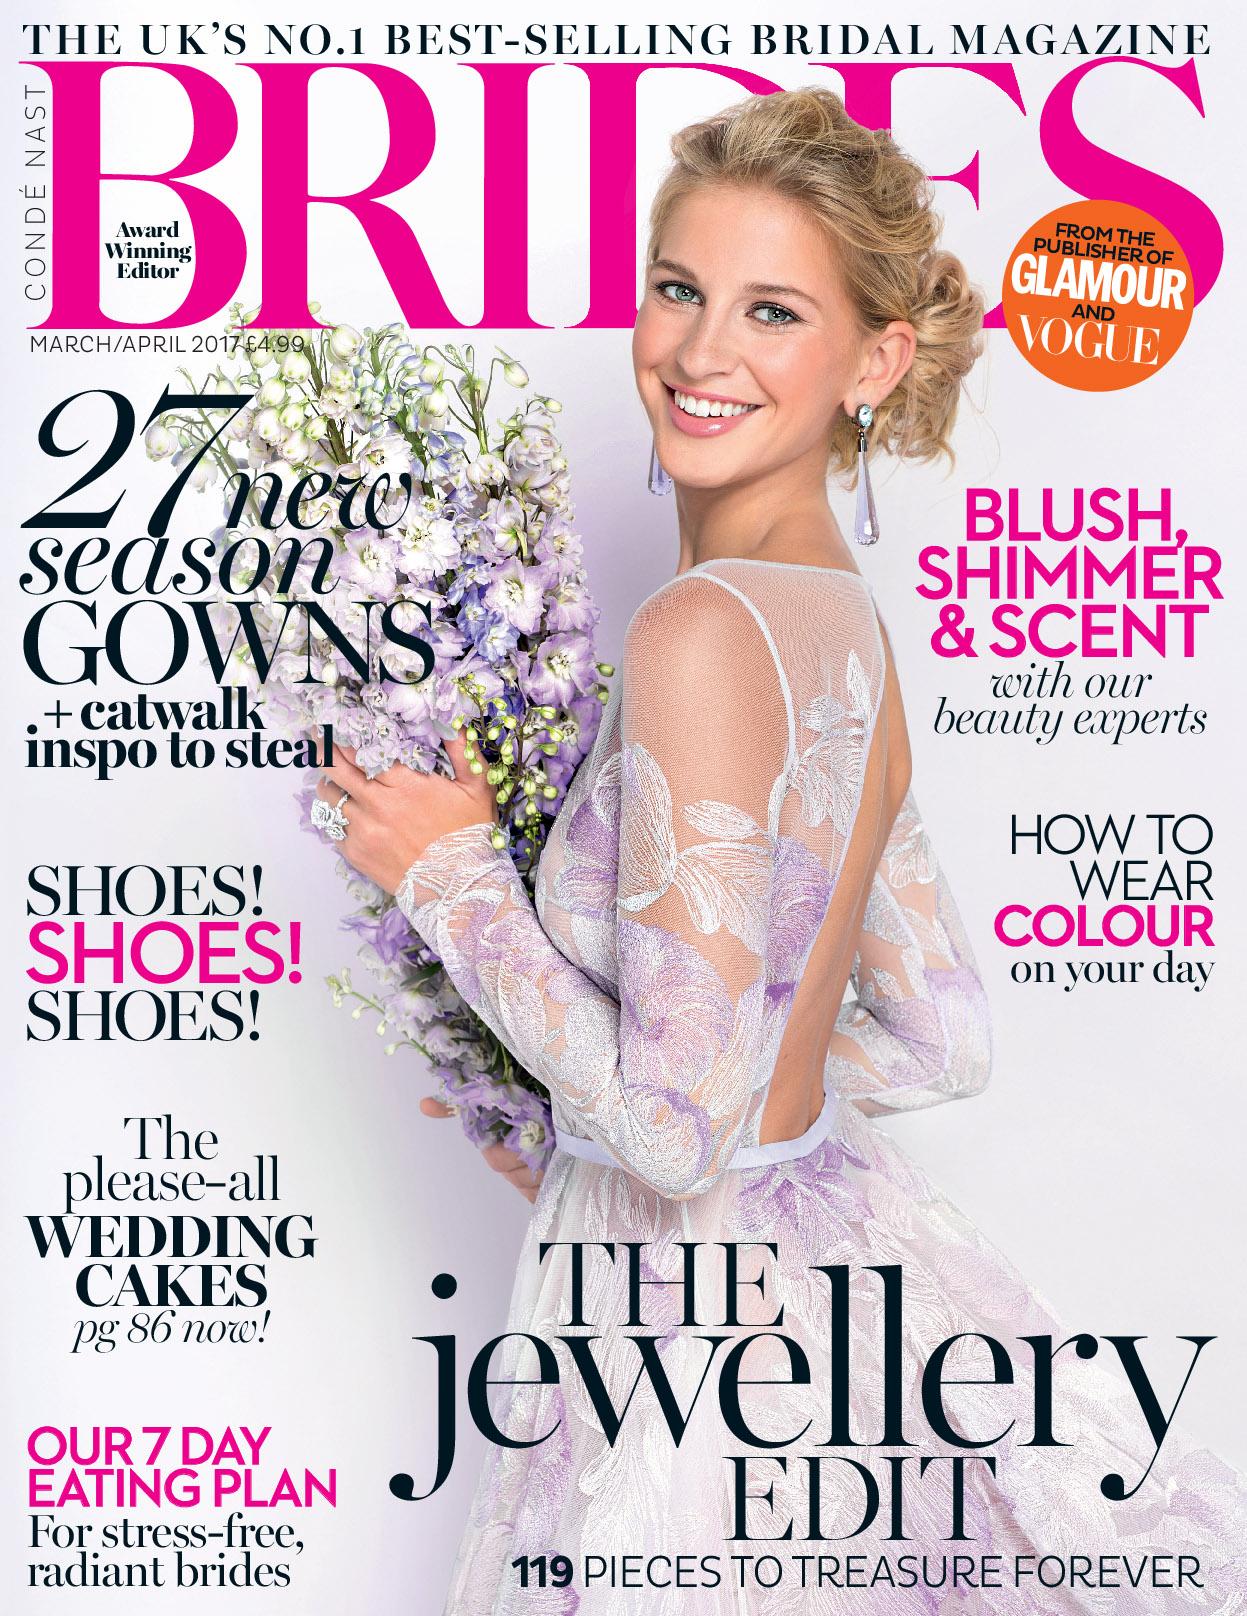 UK Brides Mar Apr 17 Cover.jpg